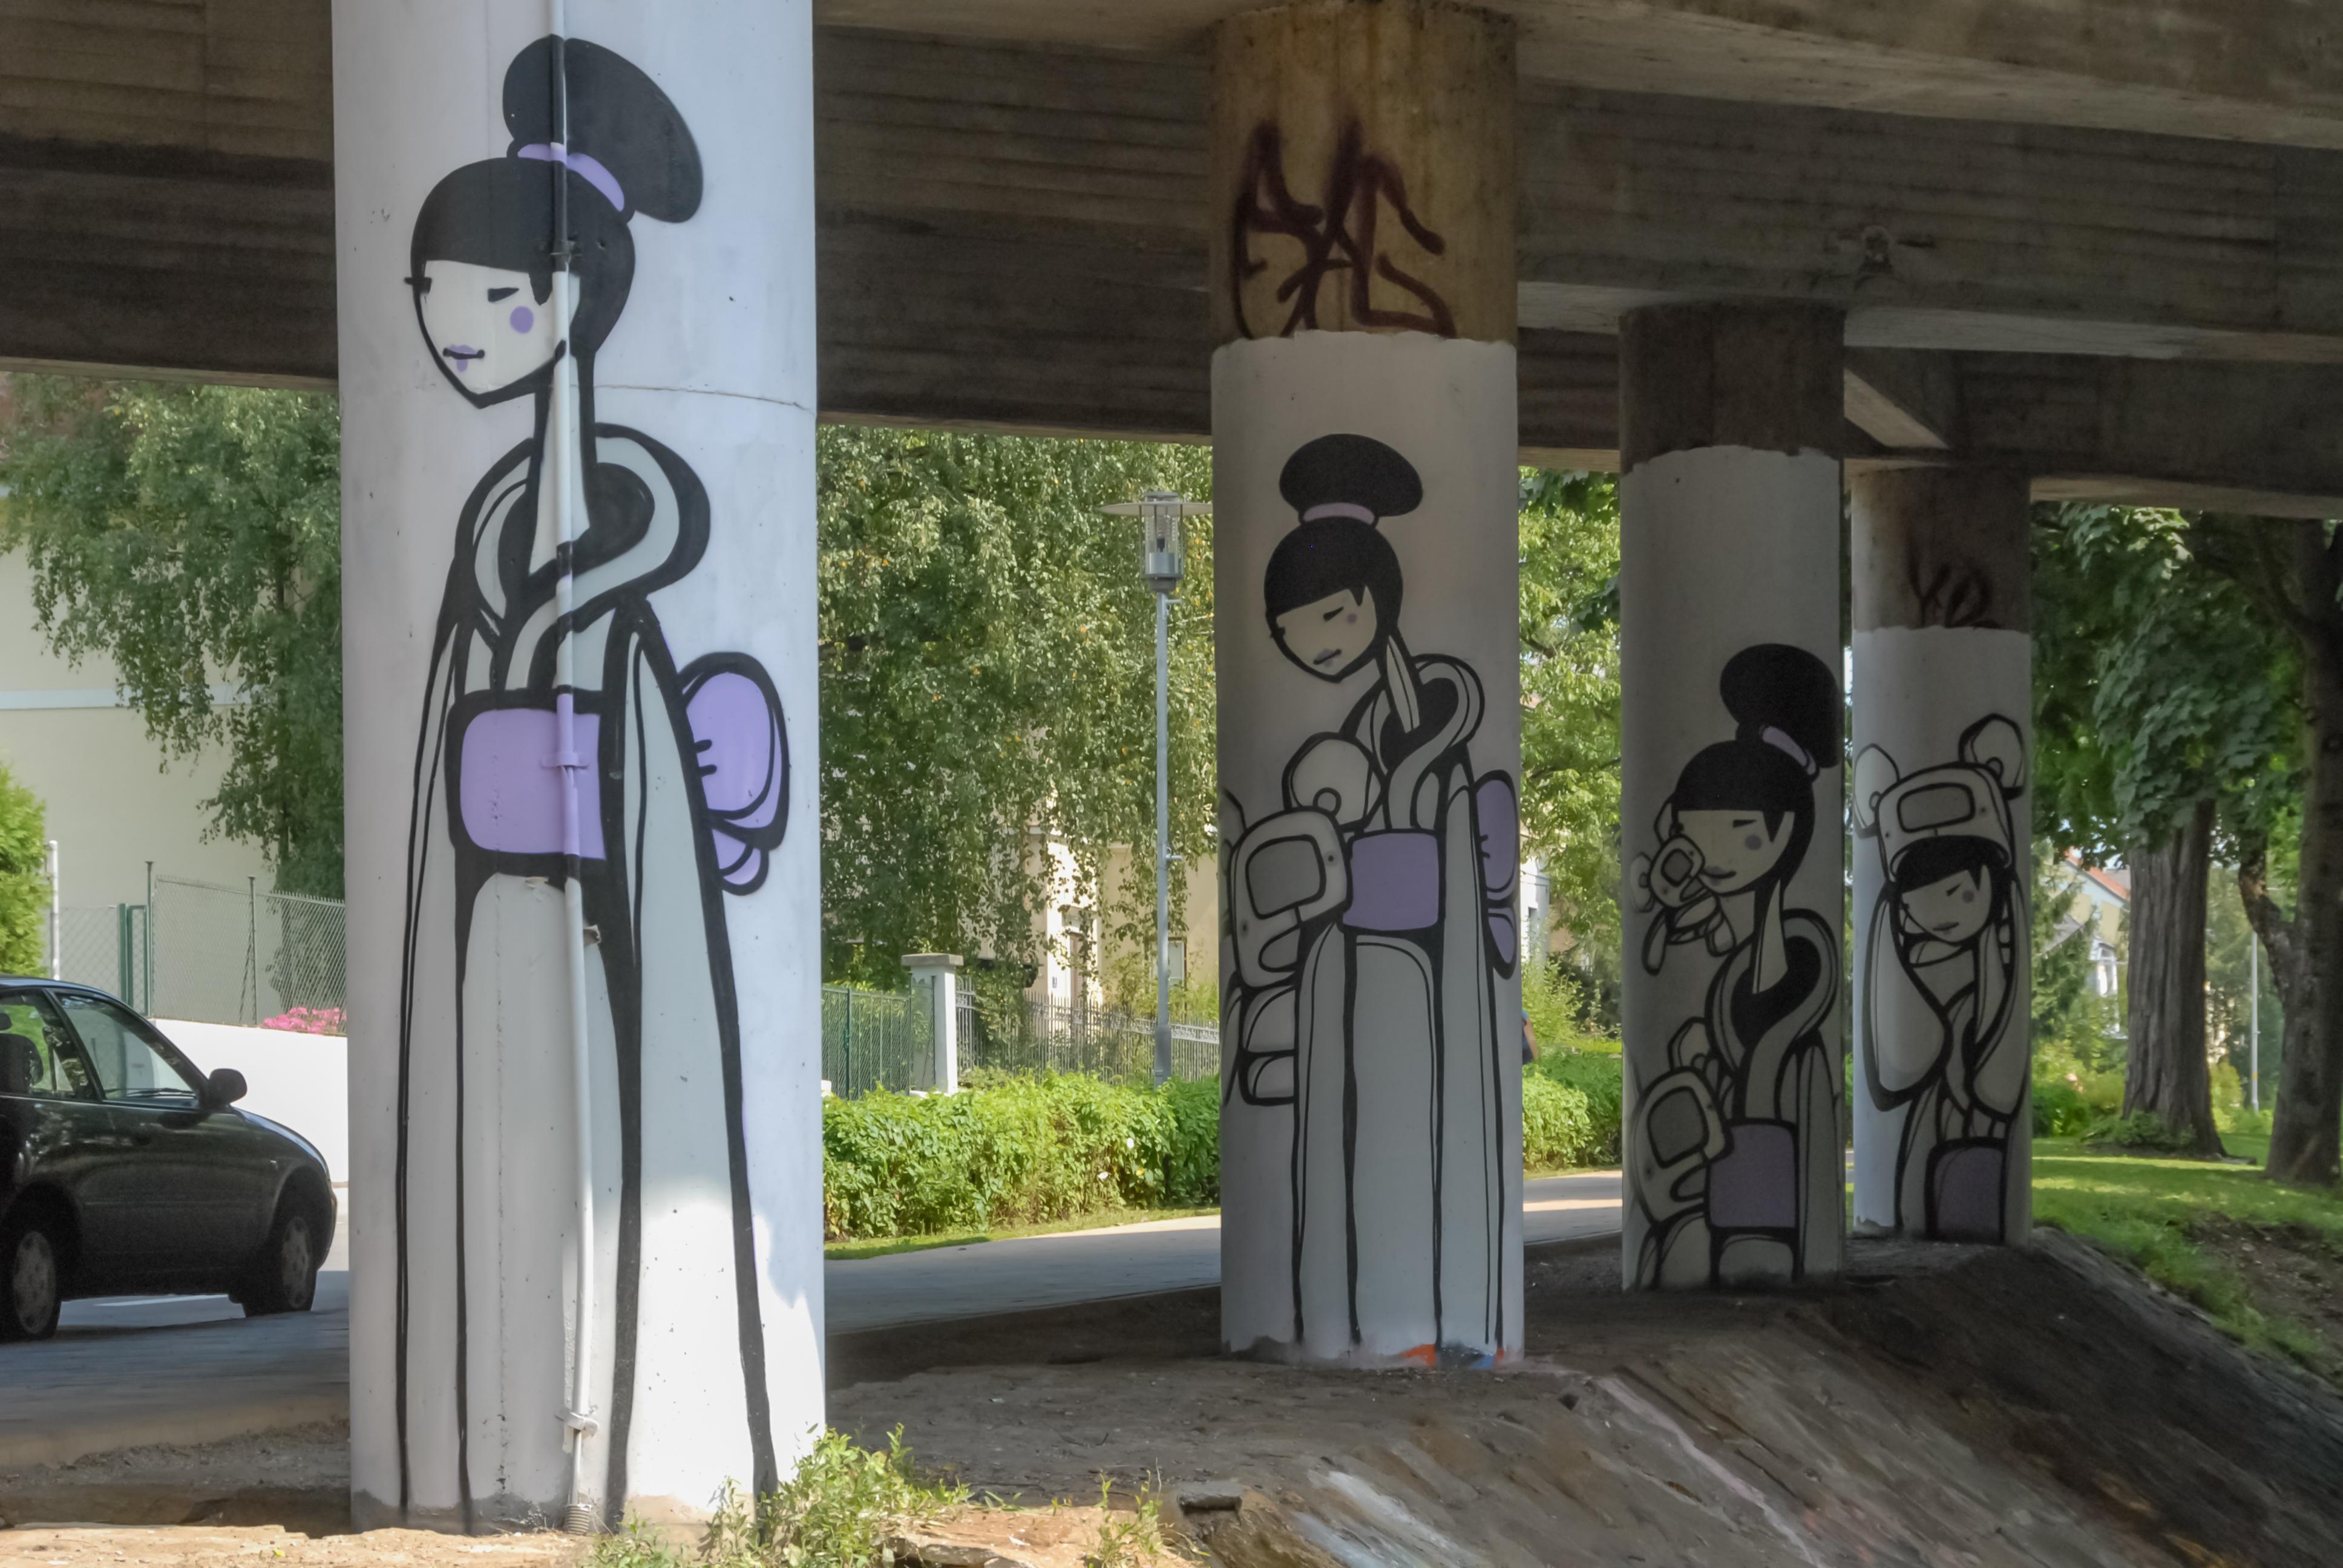 File:Klagenfurt Tarviser Strasse Autobahn-Bruecken-Pfeiler Graffiti  21082008 1410.jpg